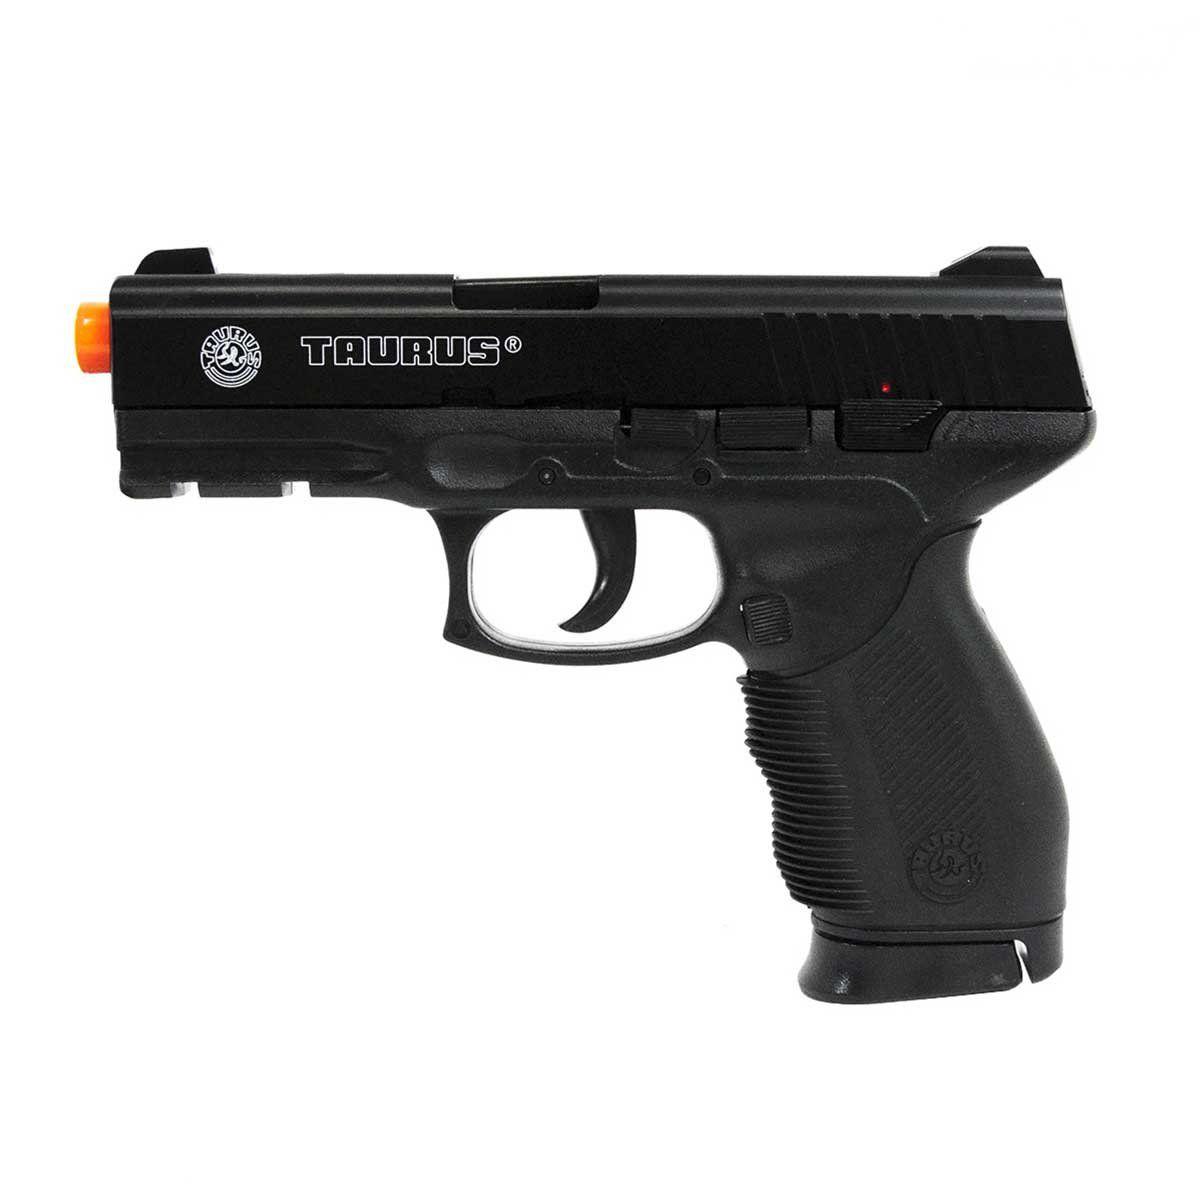 Pistola de Airsoft Taurus Cybergun 24/7 6mm + Magazine Extra